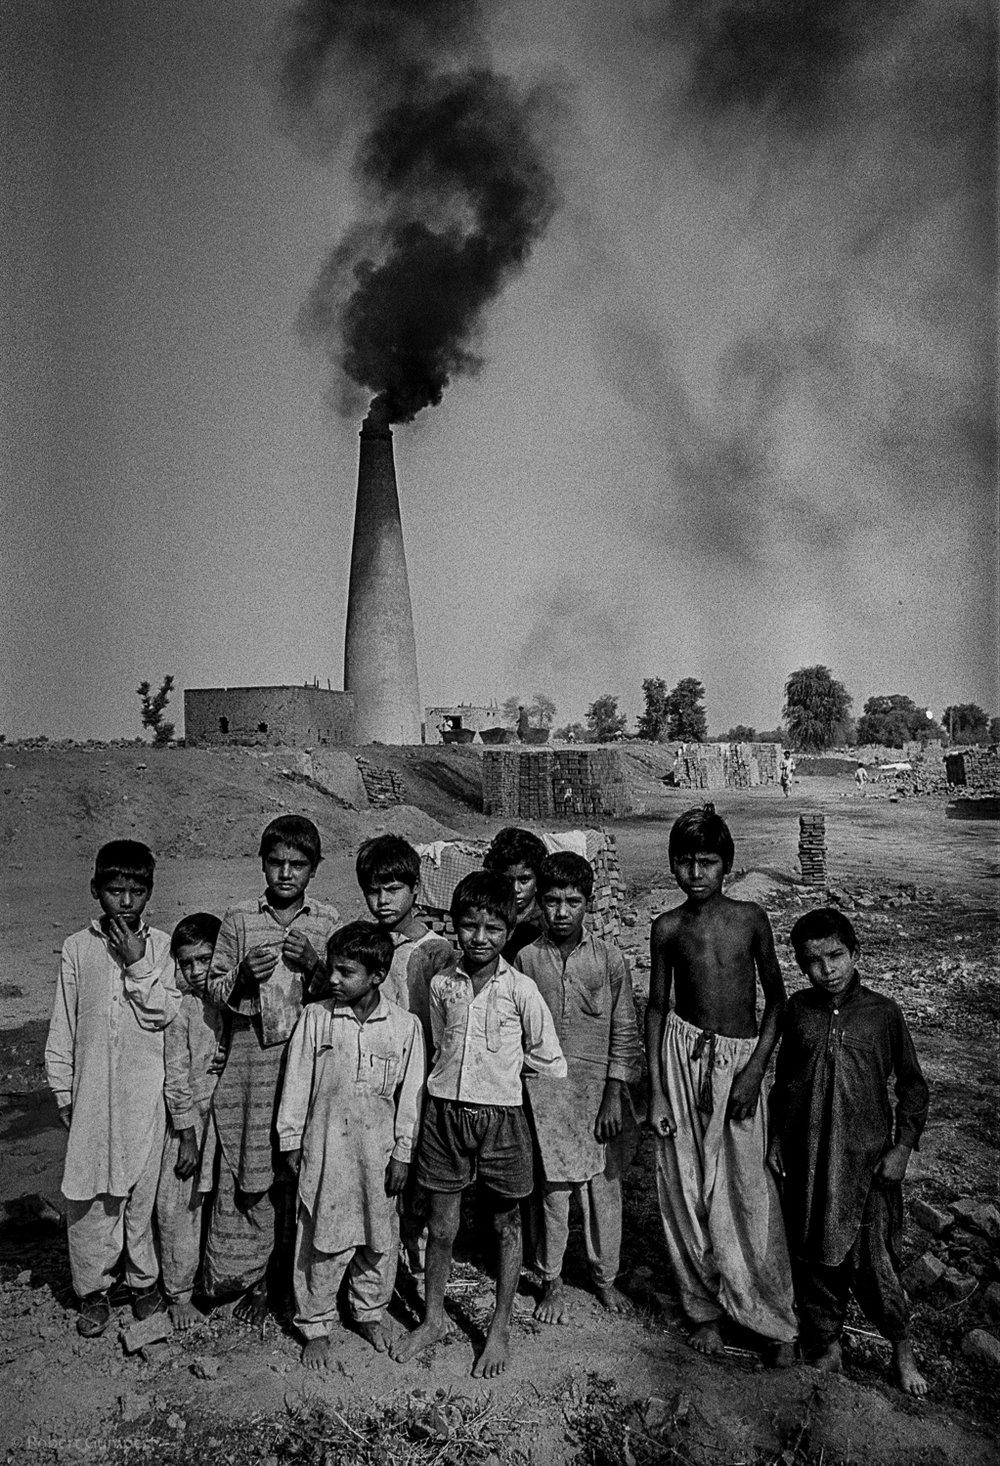 1990: Central Pakistan. Child brick makers.